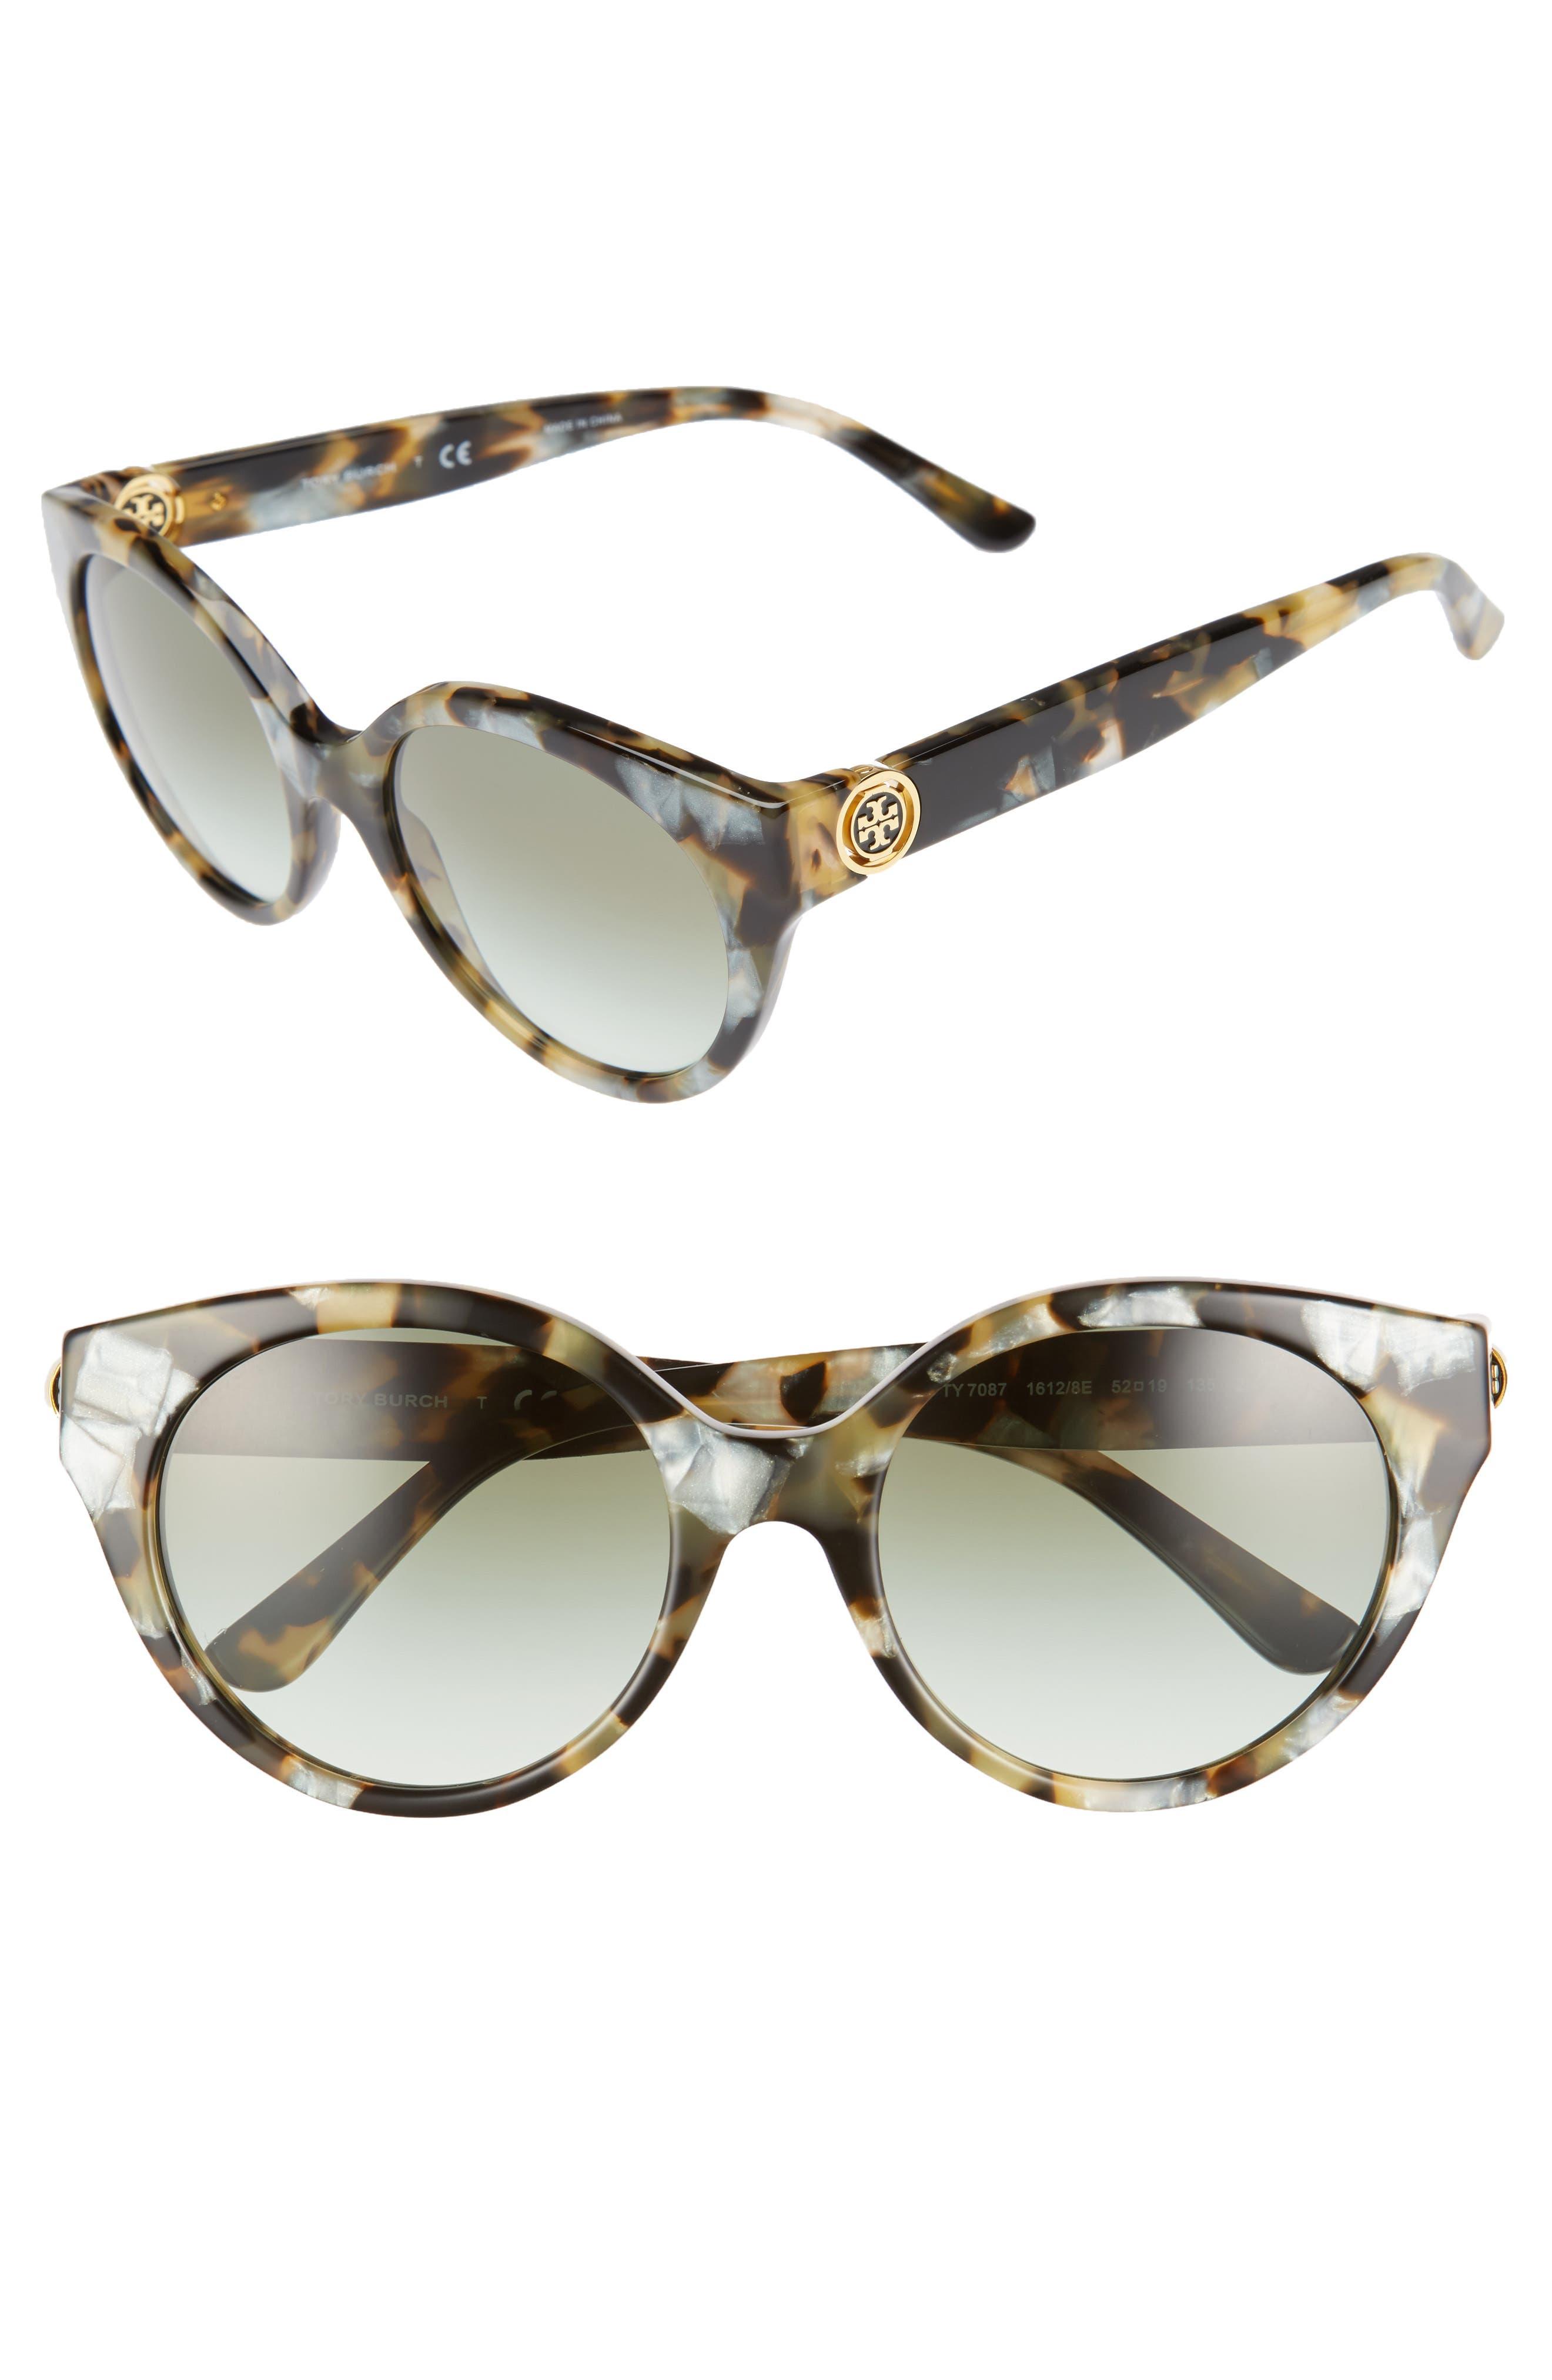 Tory Burch 52mm Retro Sunglasses